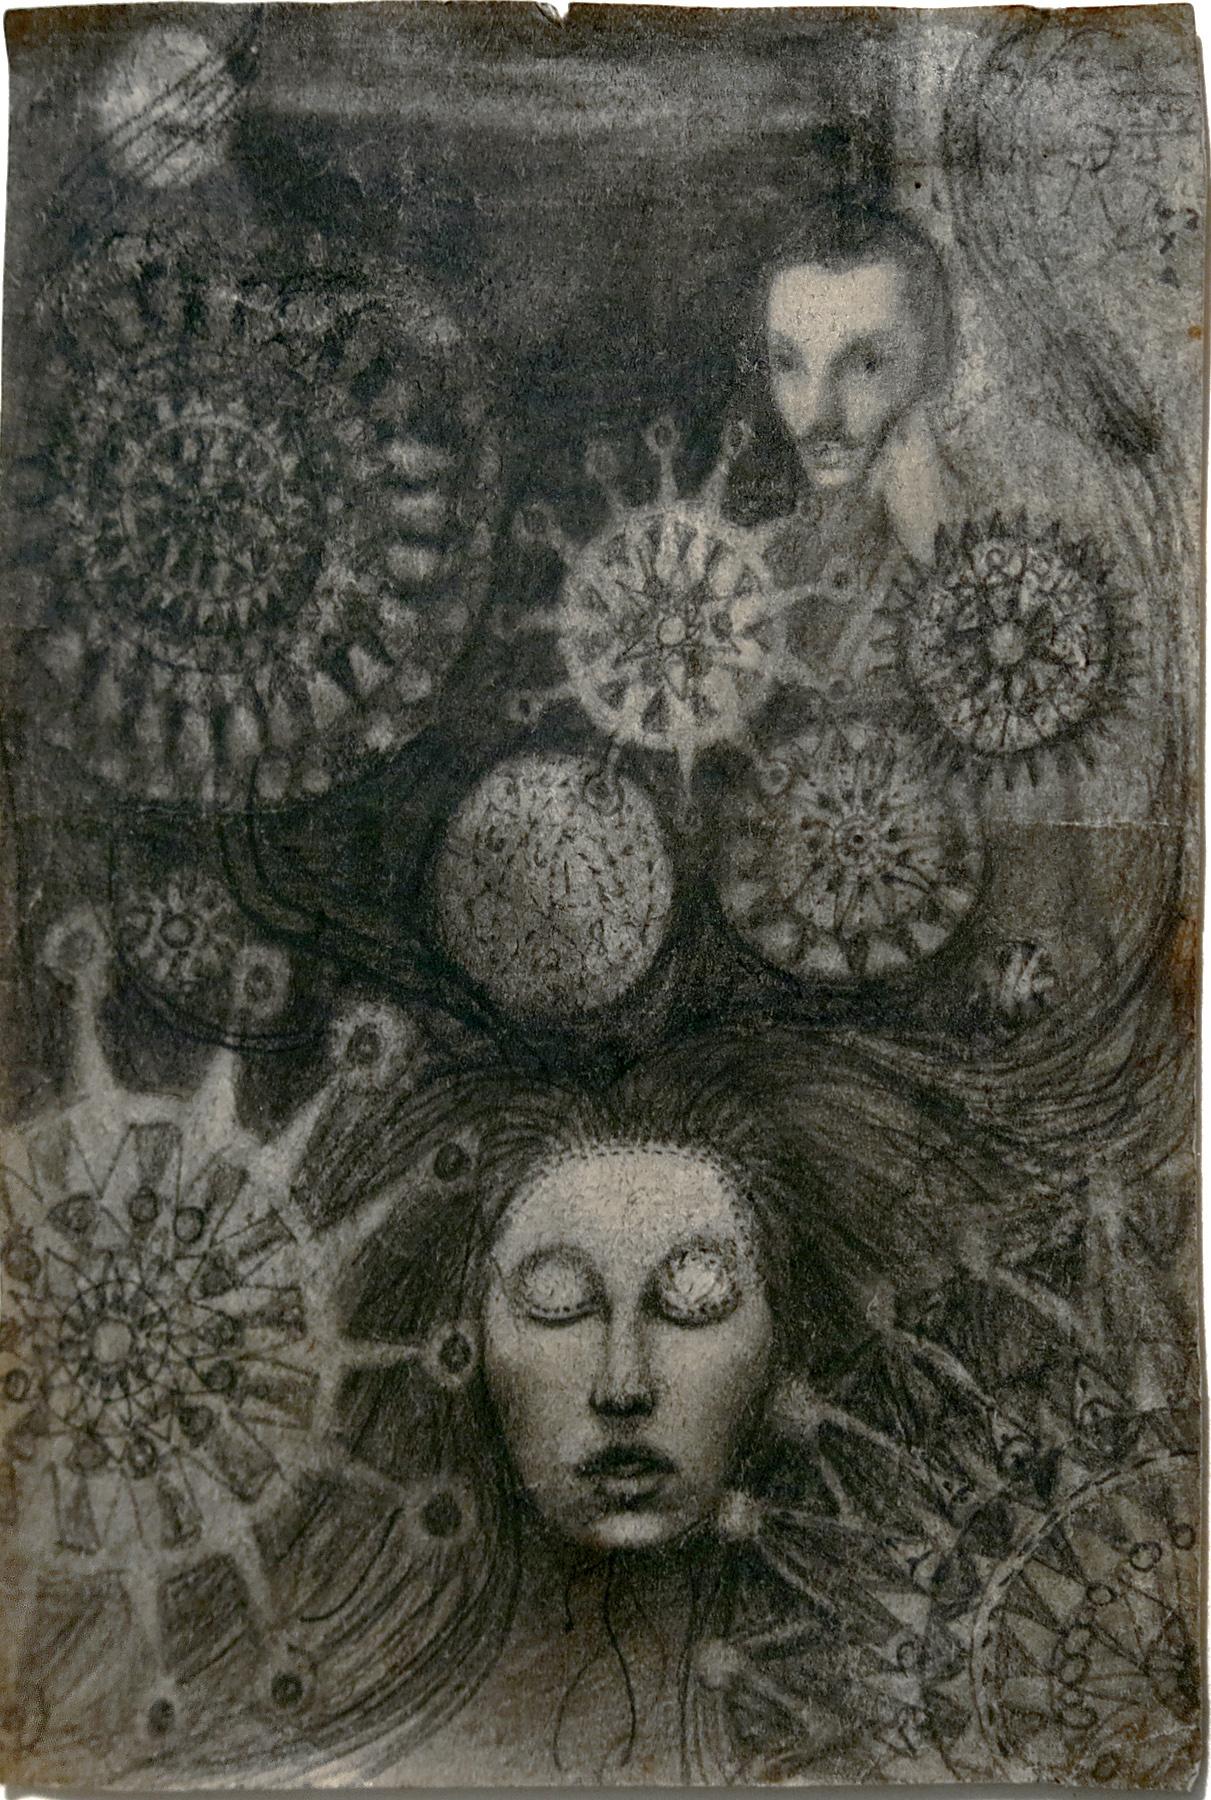 June Leaf, Arthur, 1951, Pencil on paper, 6.25h x 4.5w in.